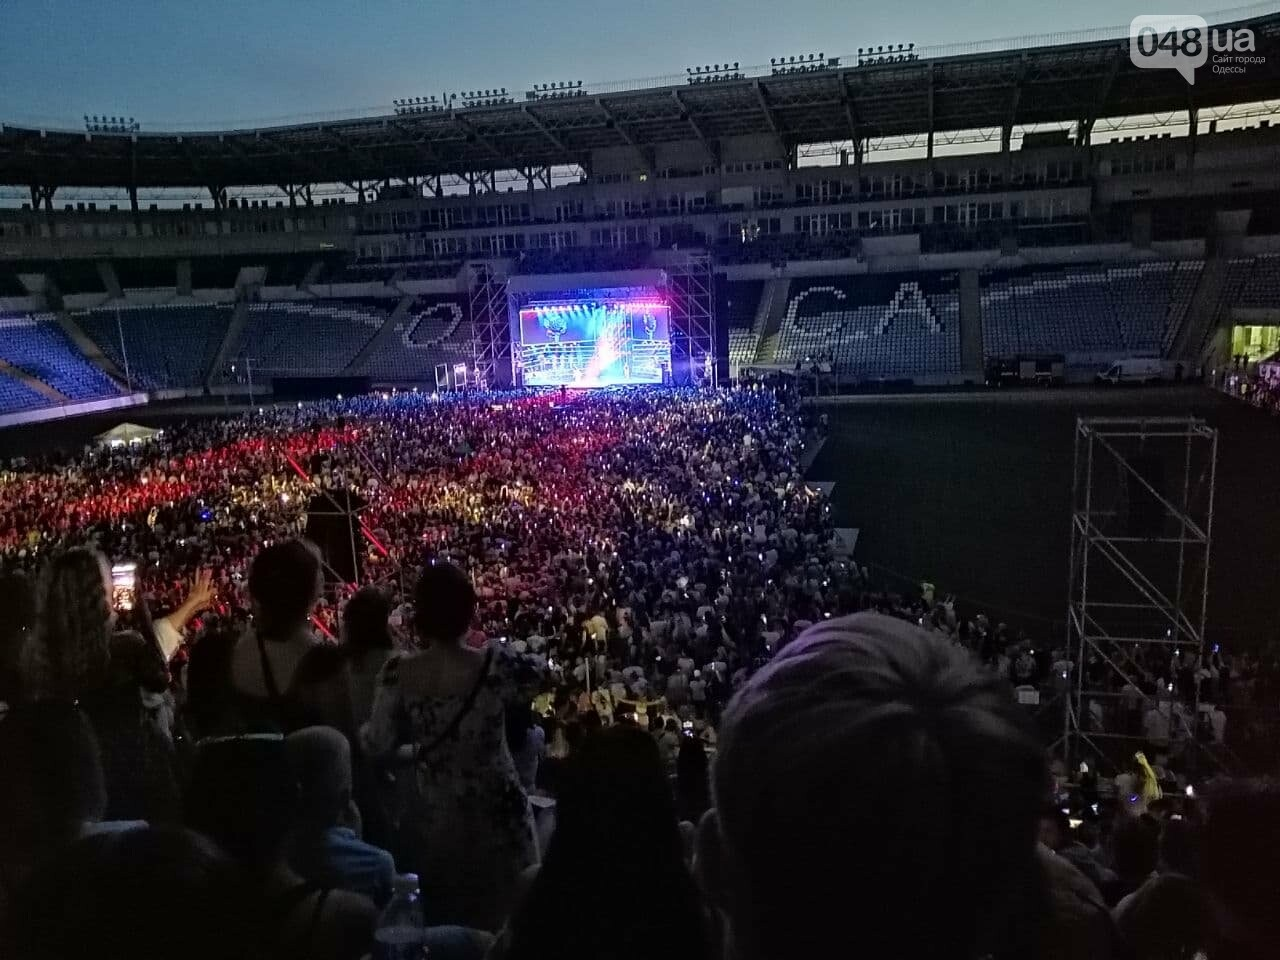 Монатик на стадионе спел все песни об Одессе, - ФОТО, ВИДЕО, фото-13